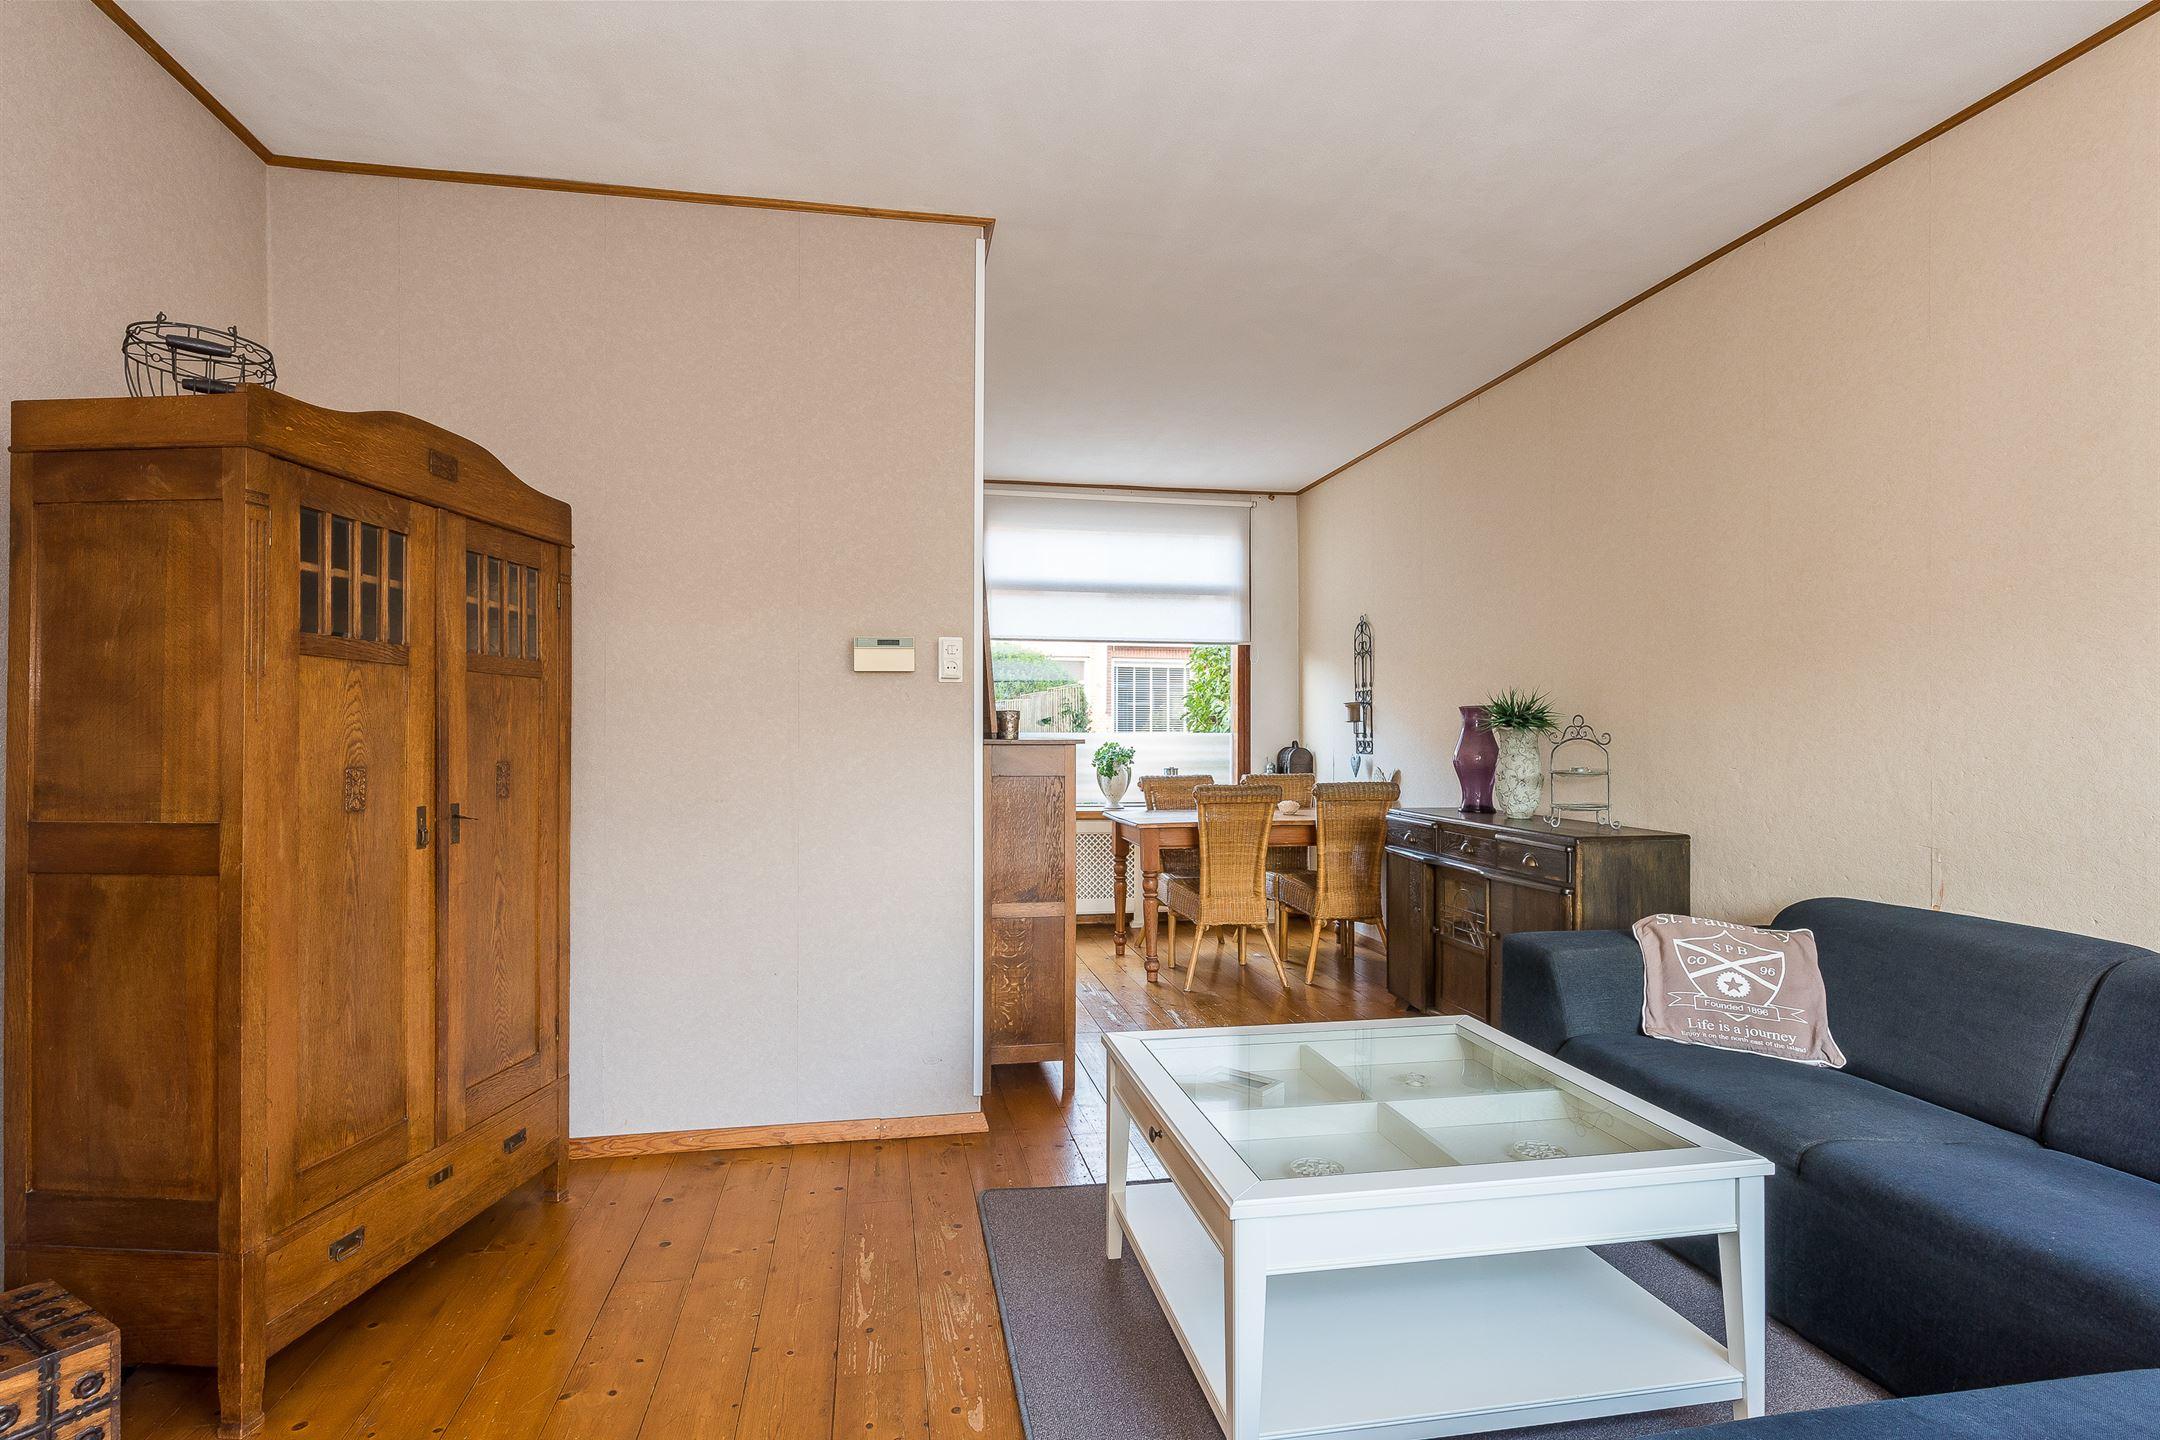 Huis te koop: leliestraat 33 3135 xj vlaardingen [funda]